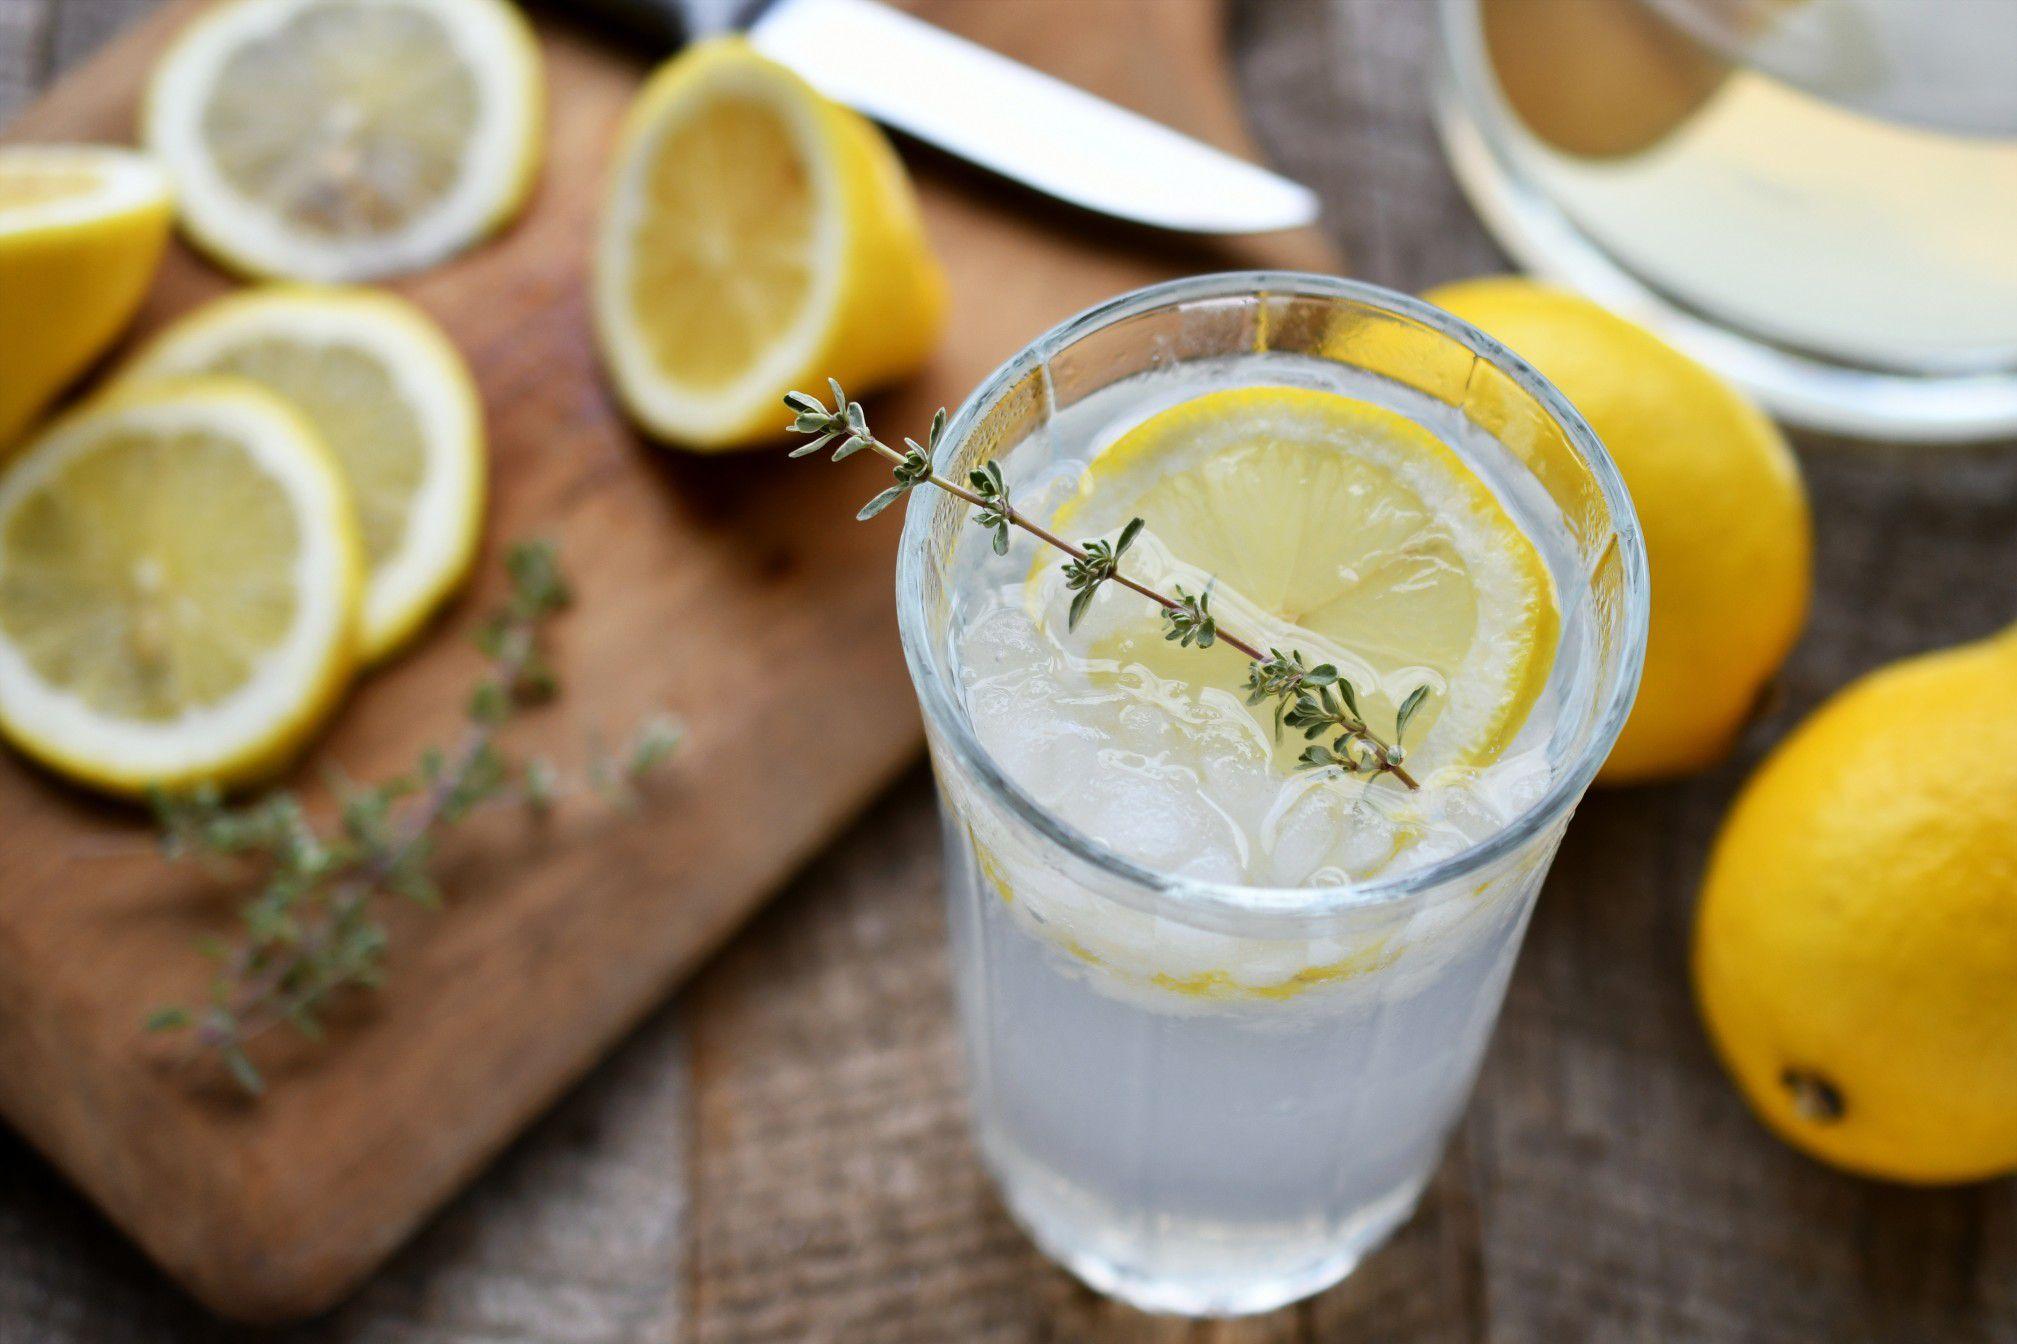 Homemade Agave Lemonade Recipe